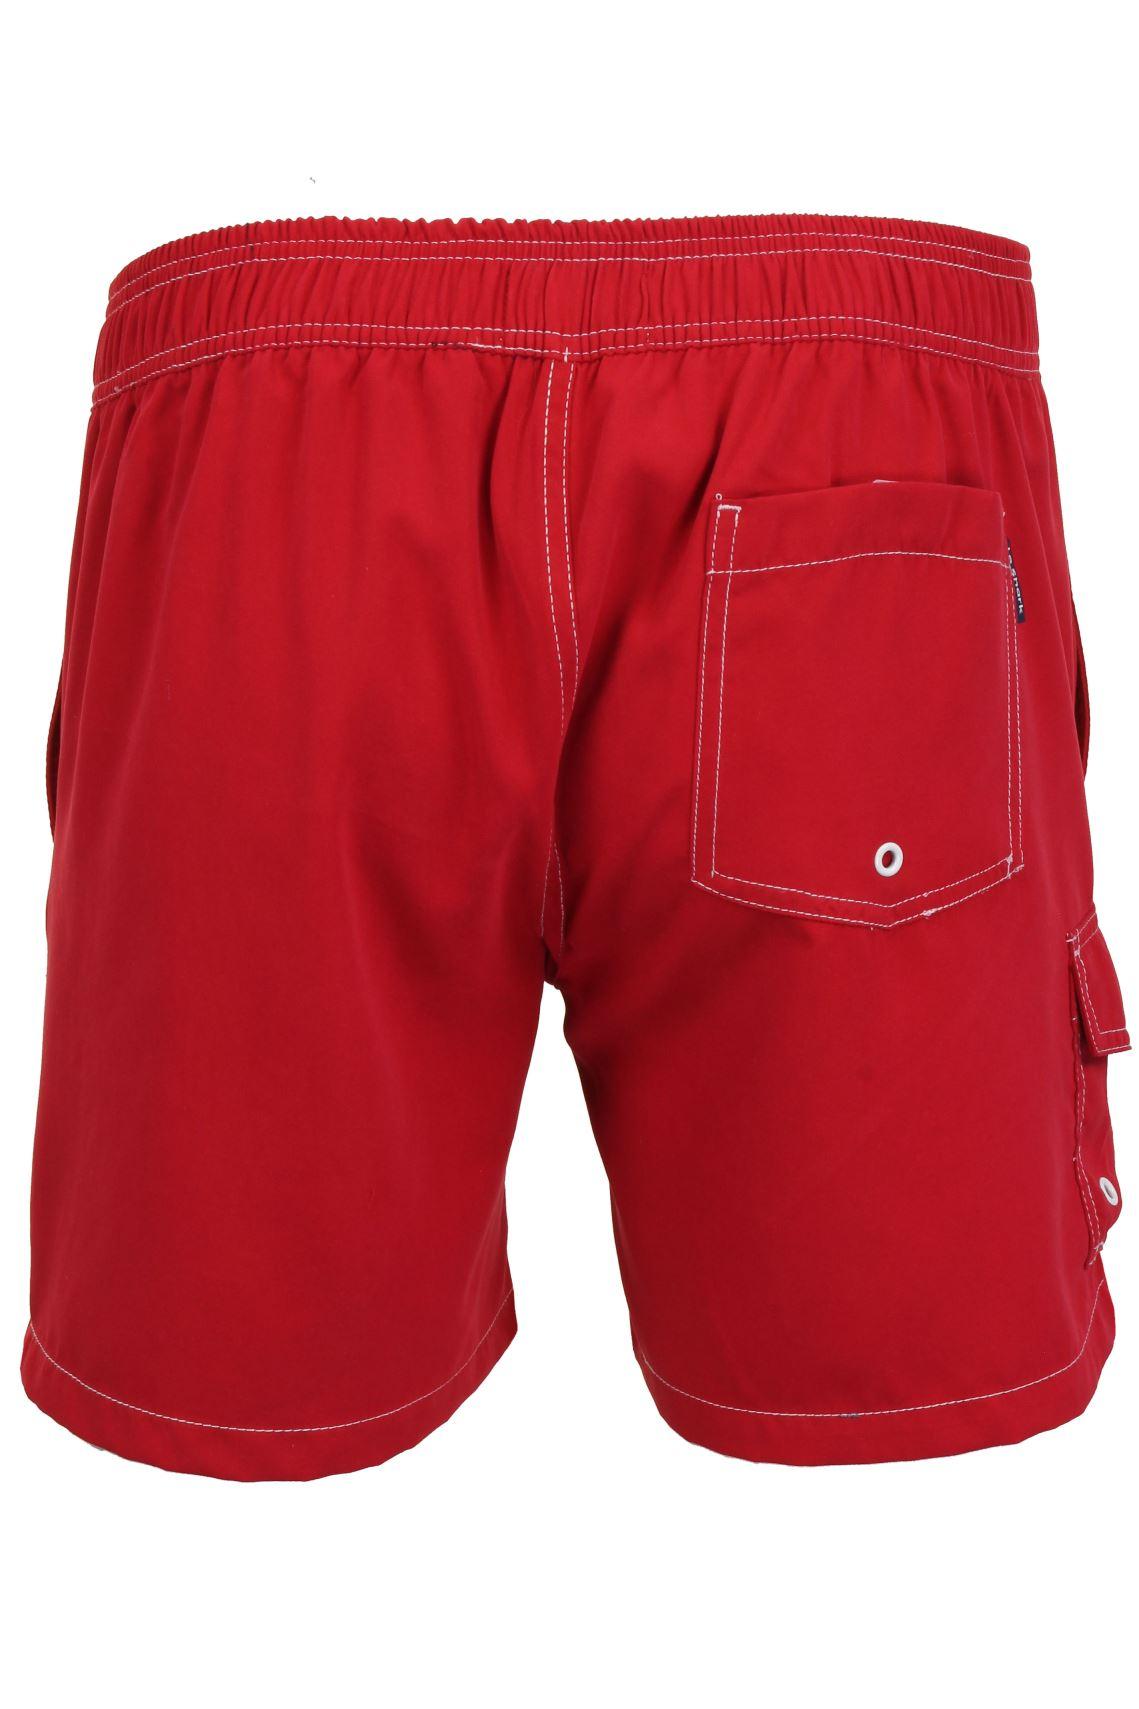 Amazon.com: Shark Animal Men's Quick Dry Beach Board ... |Shark Board Shorts For Men